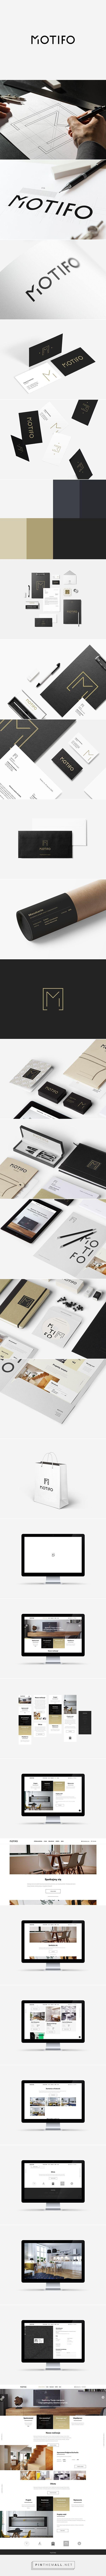 MOTIFO - Interior Design Architect | Branding & Website on Behance - created via http://pinthemall.net /